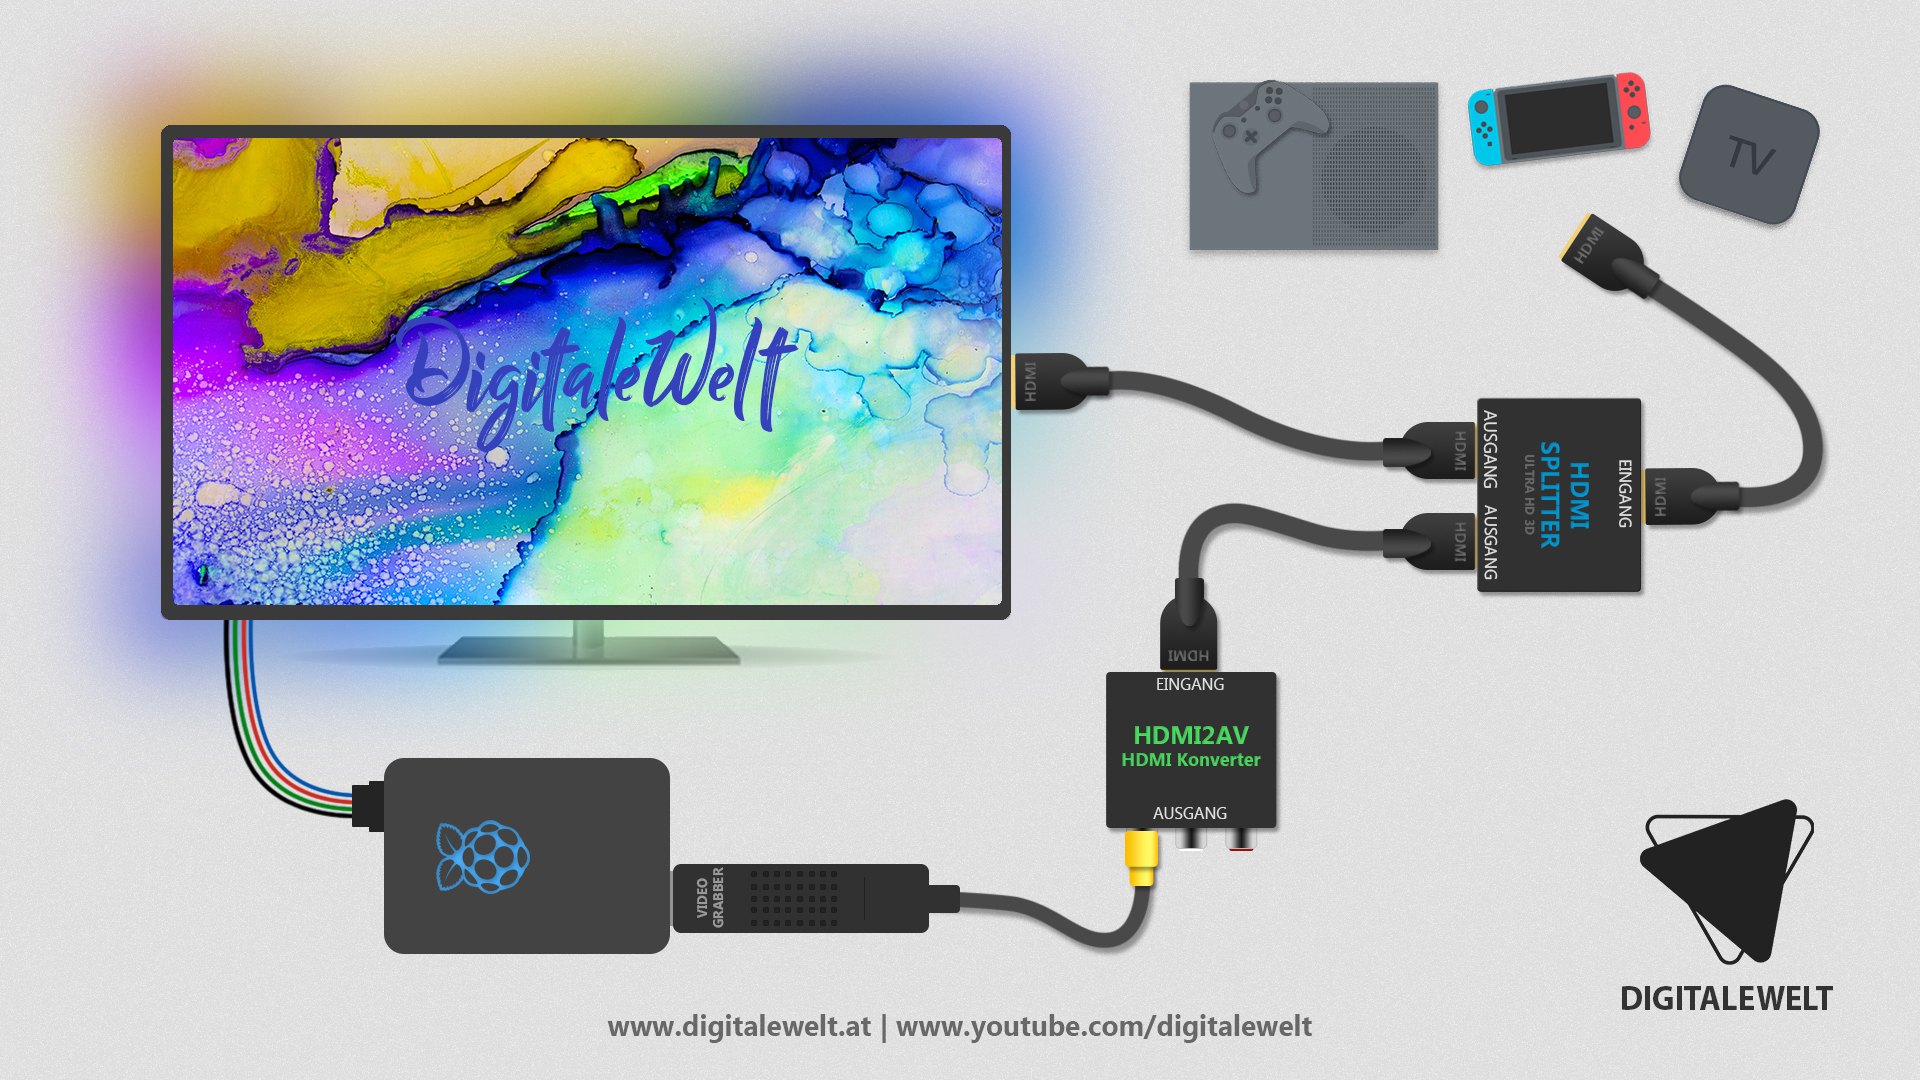 Raspberry-Pi-Ambilight-Projekt-Verkabelung-HDMI-Quelle